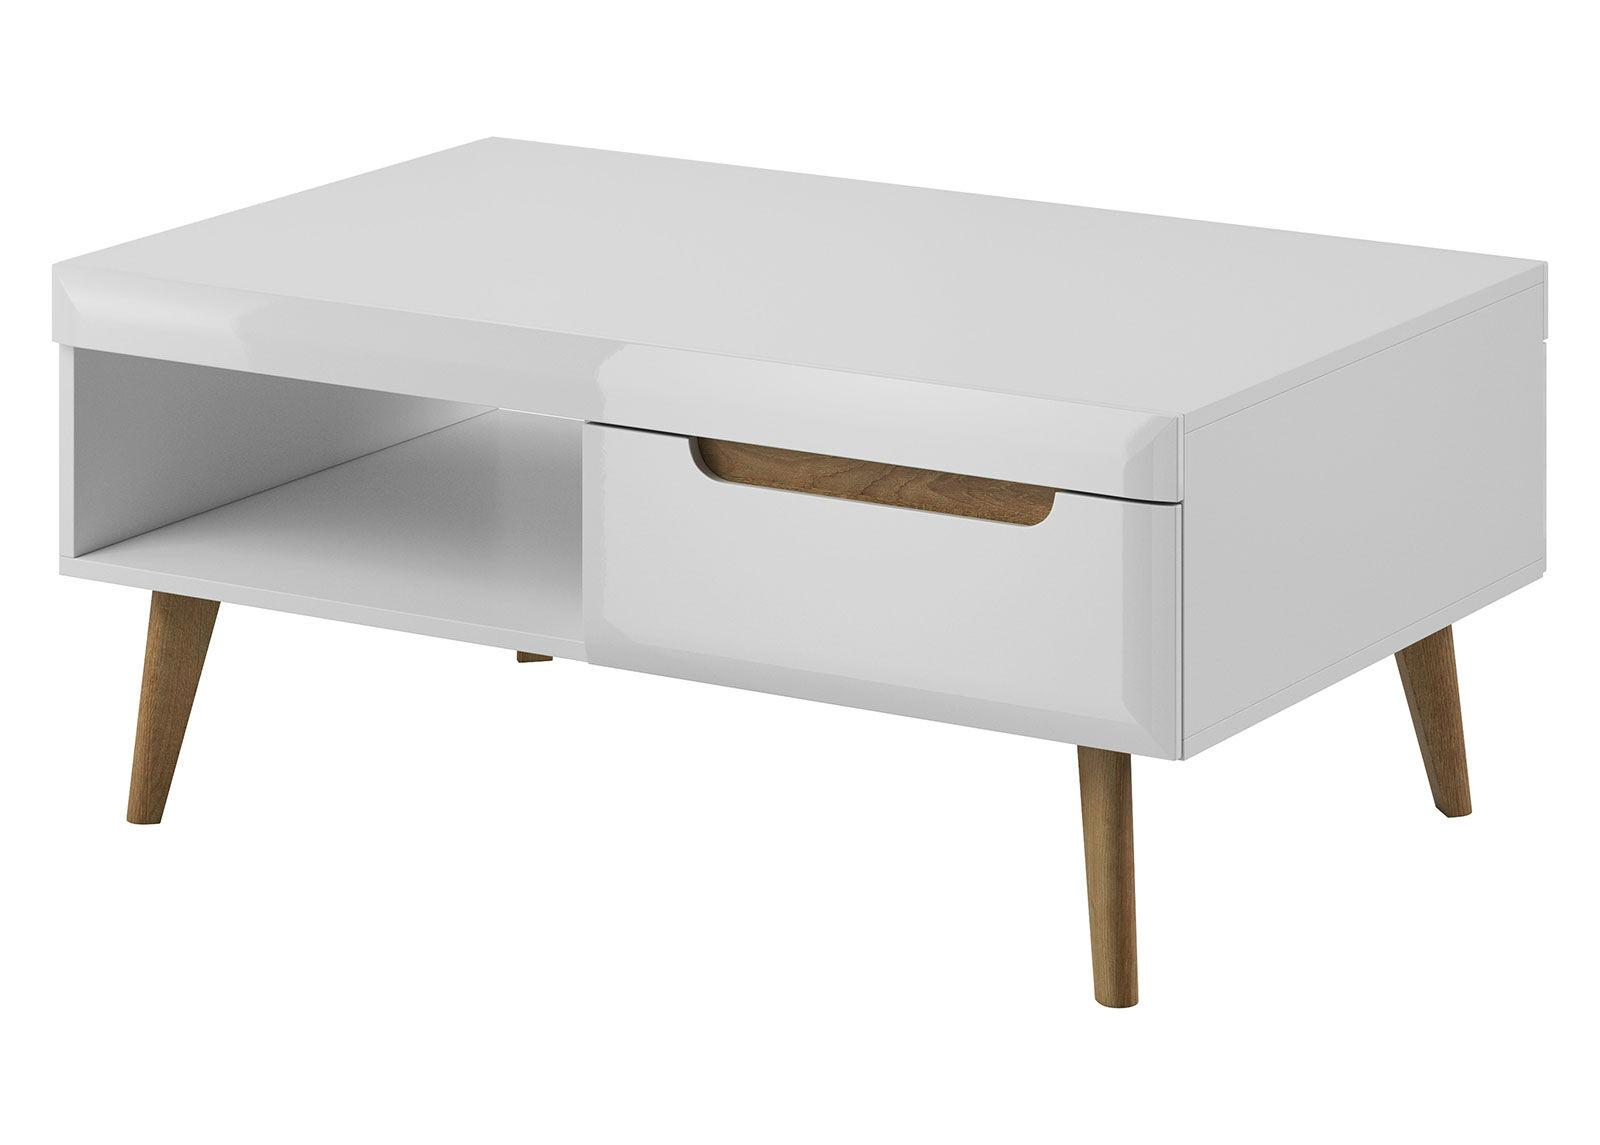 Piaski Sohvapöytä 107x67 cm